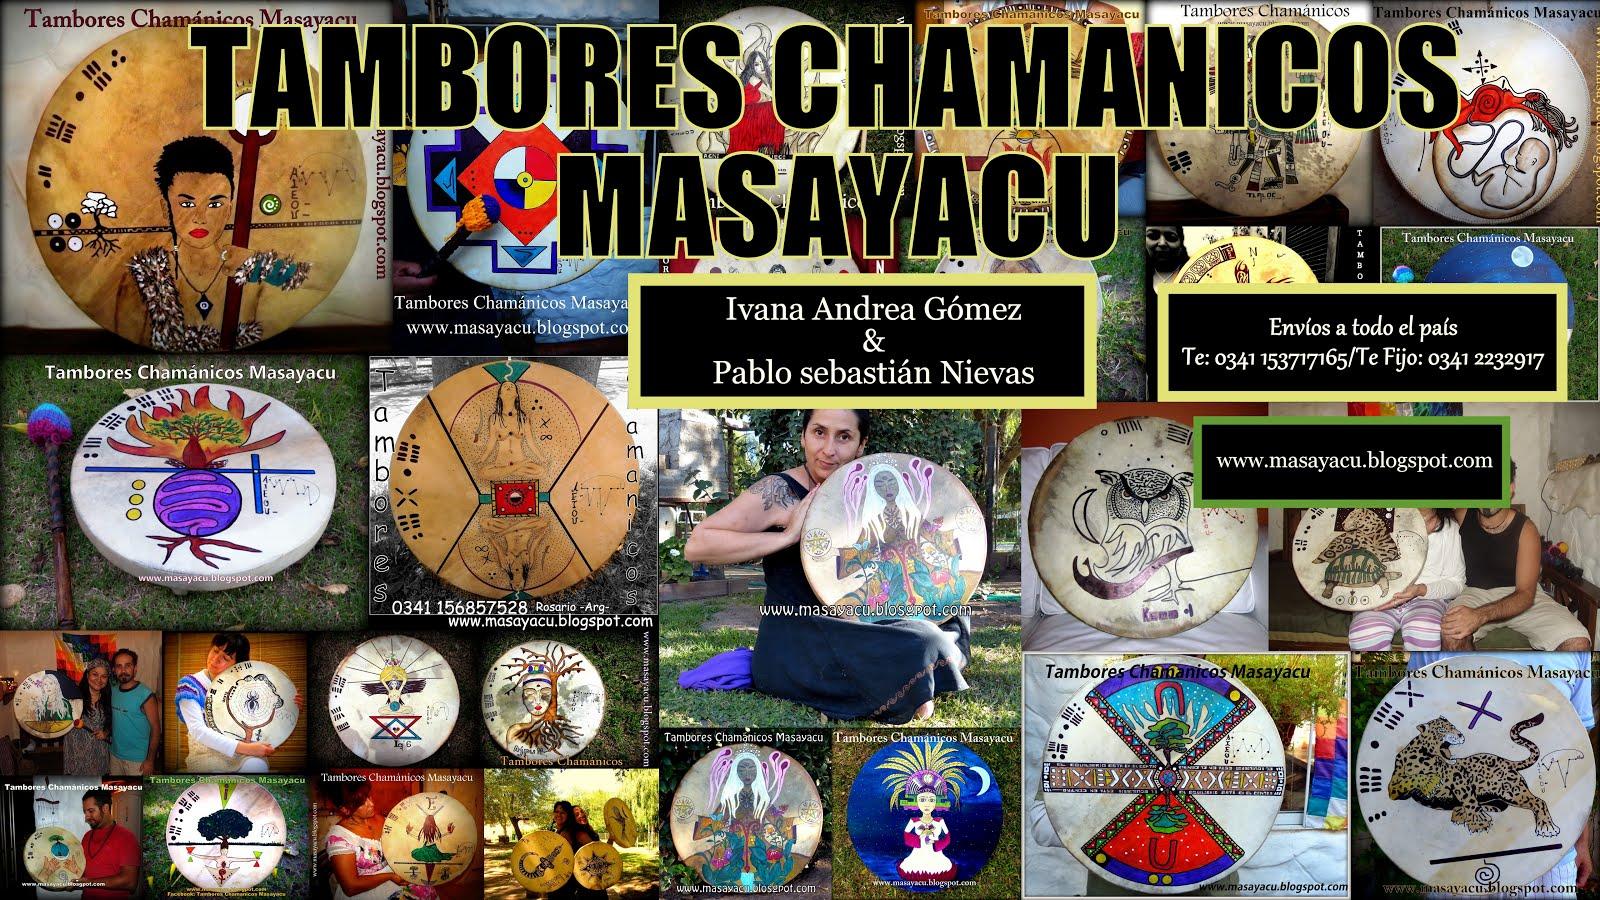 Tambores Chamánicos Masayacu